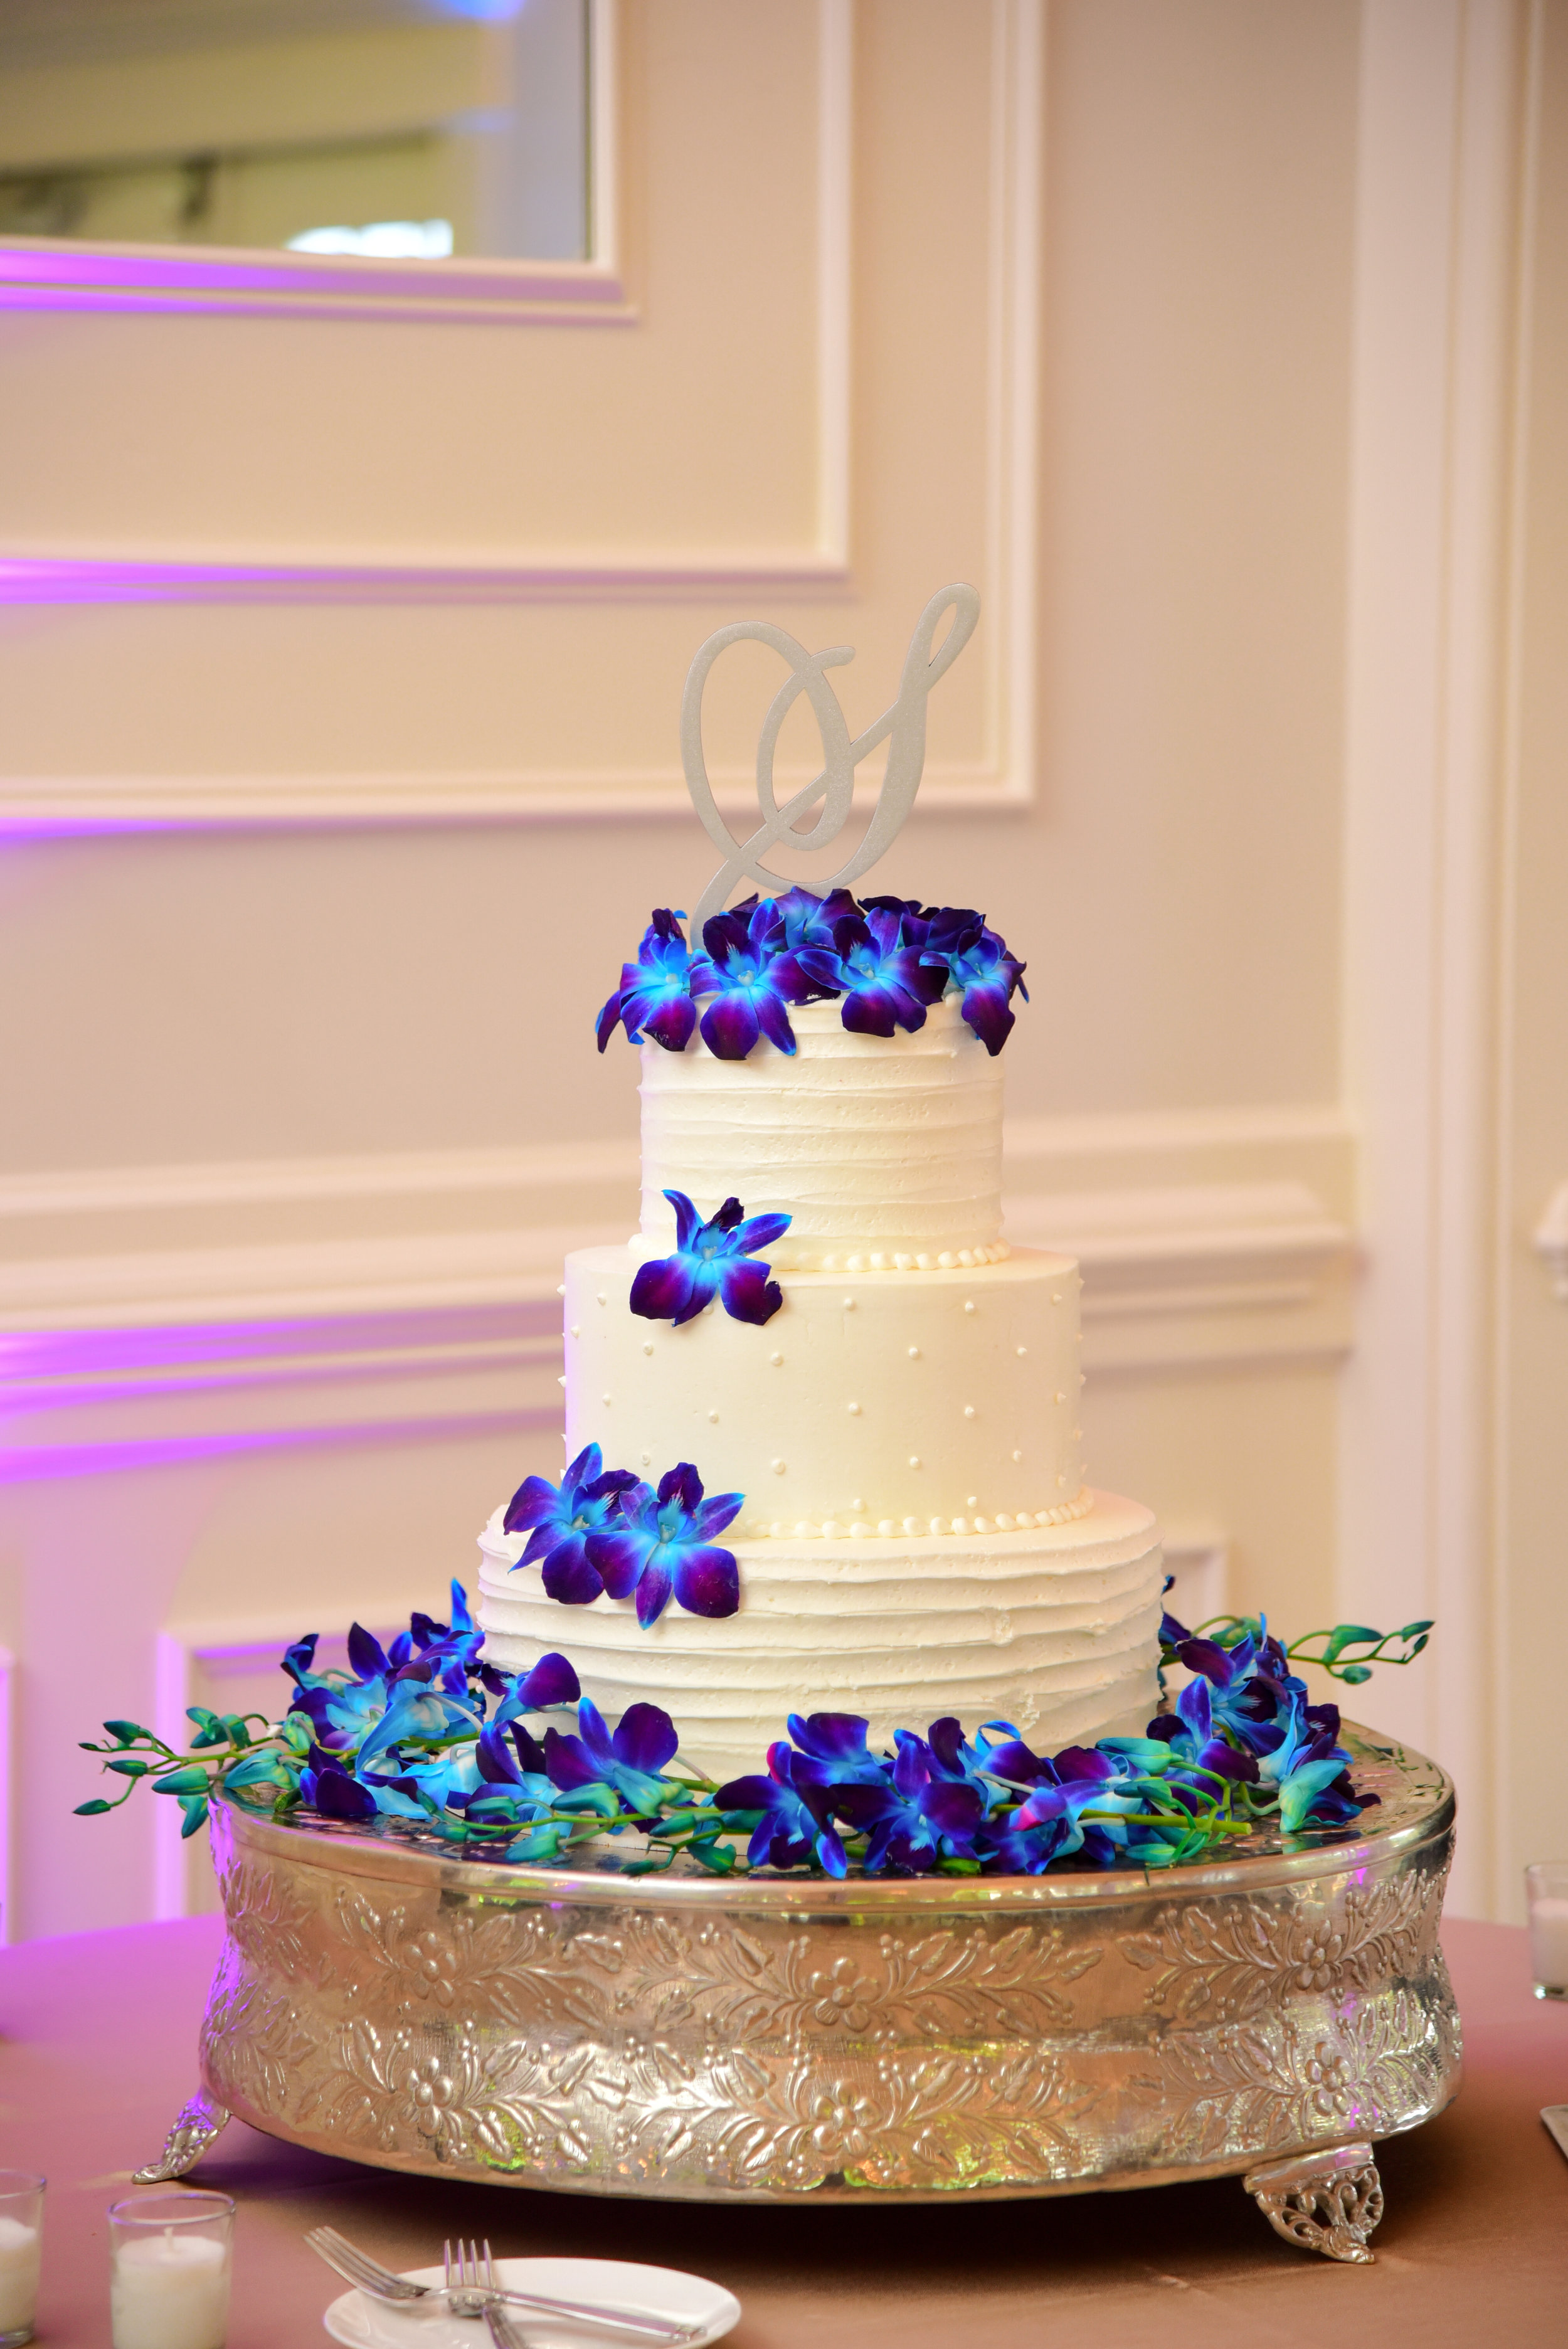 Highgrove Estate cake